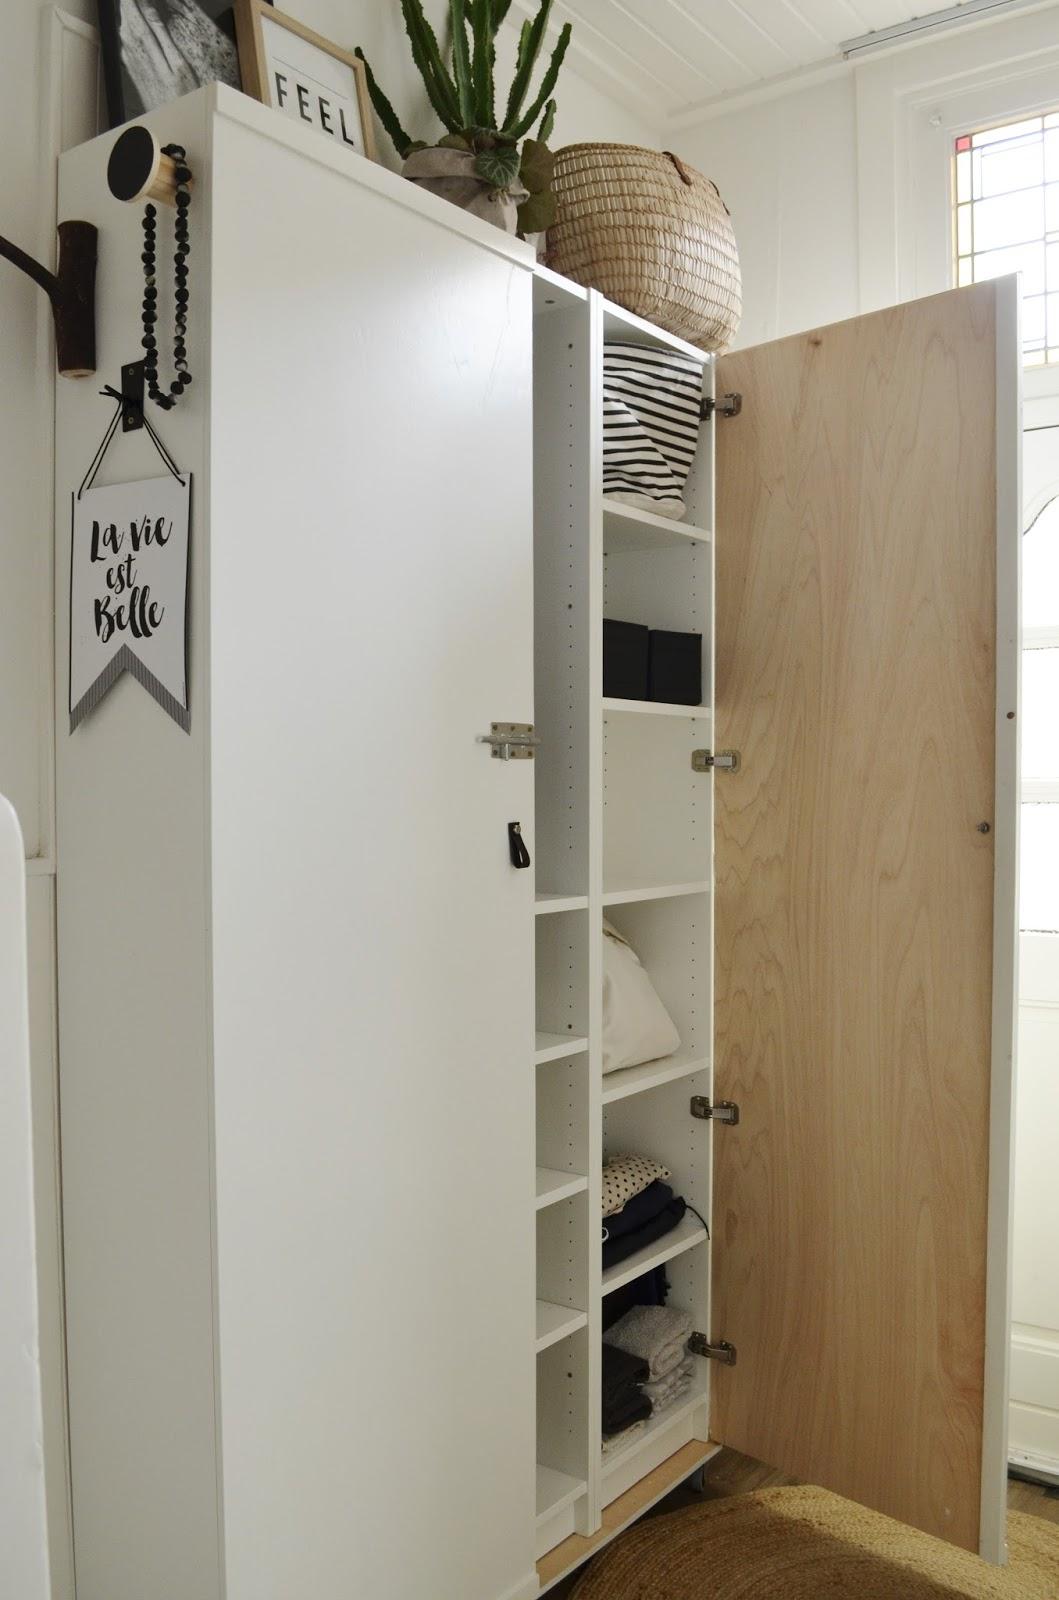 Verbazingwekkend Ikea Kast Zelf Samenstellen @RKU18 - AgnesWaMu YB-16